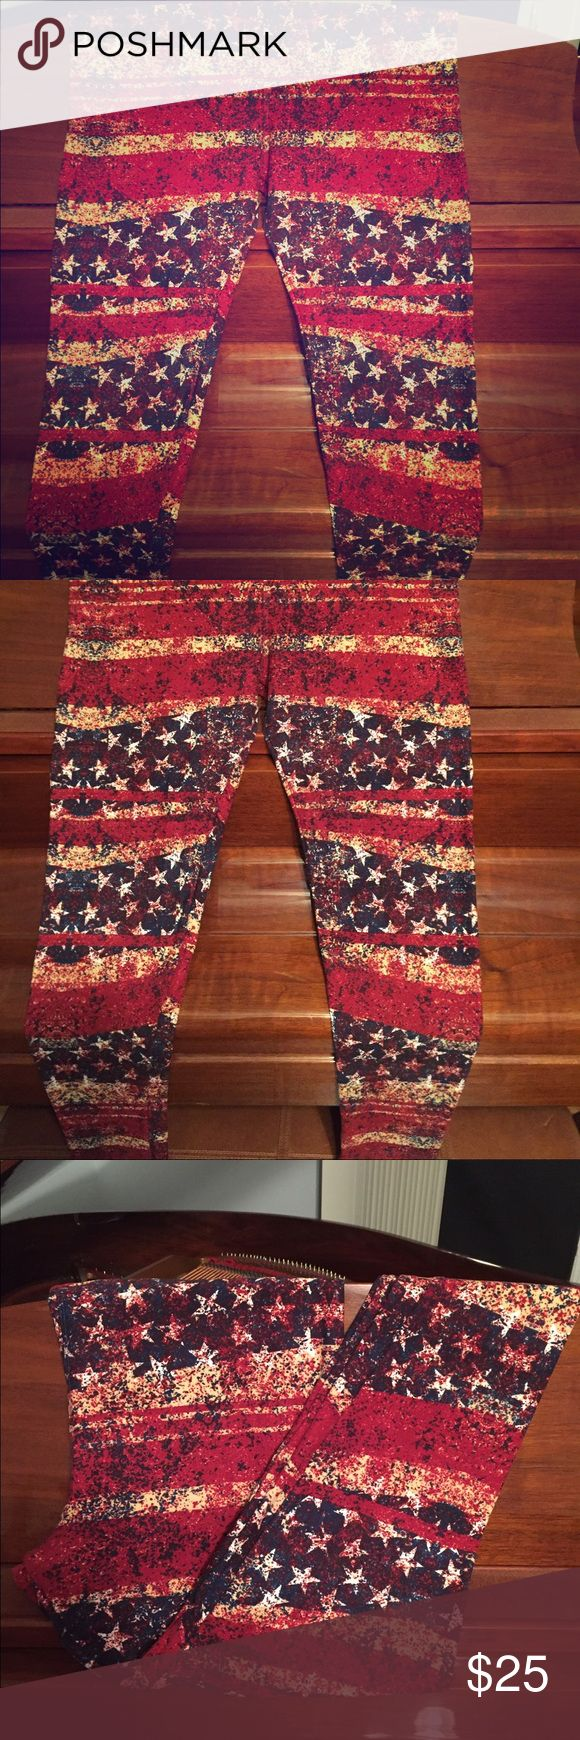 Stars & Stripes TC leggings by Lularoe, New Stars & Stripes TC leggings by Lularoe, New without tags, never washed or worn.  Americana collection. LuLaRoe Pants Leggings